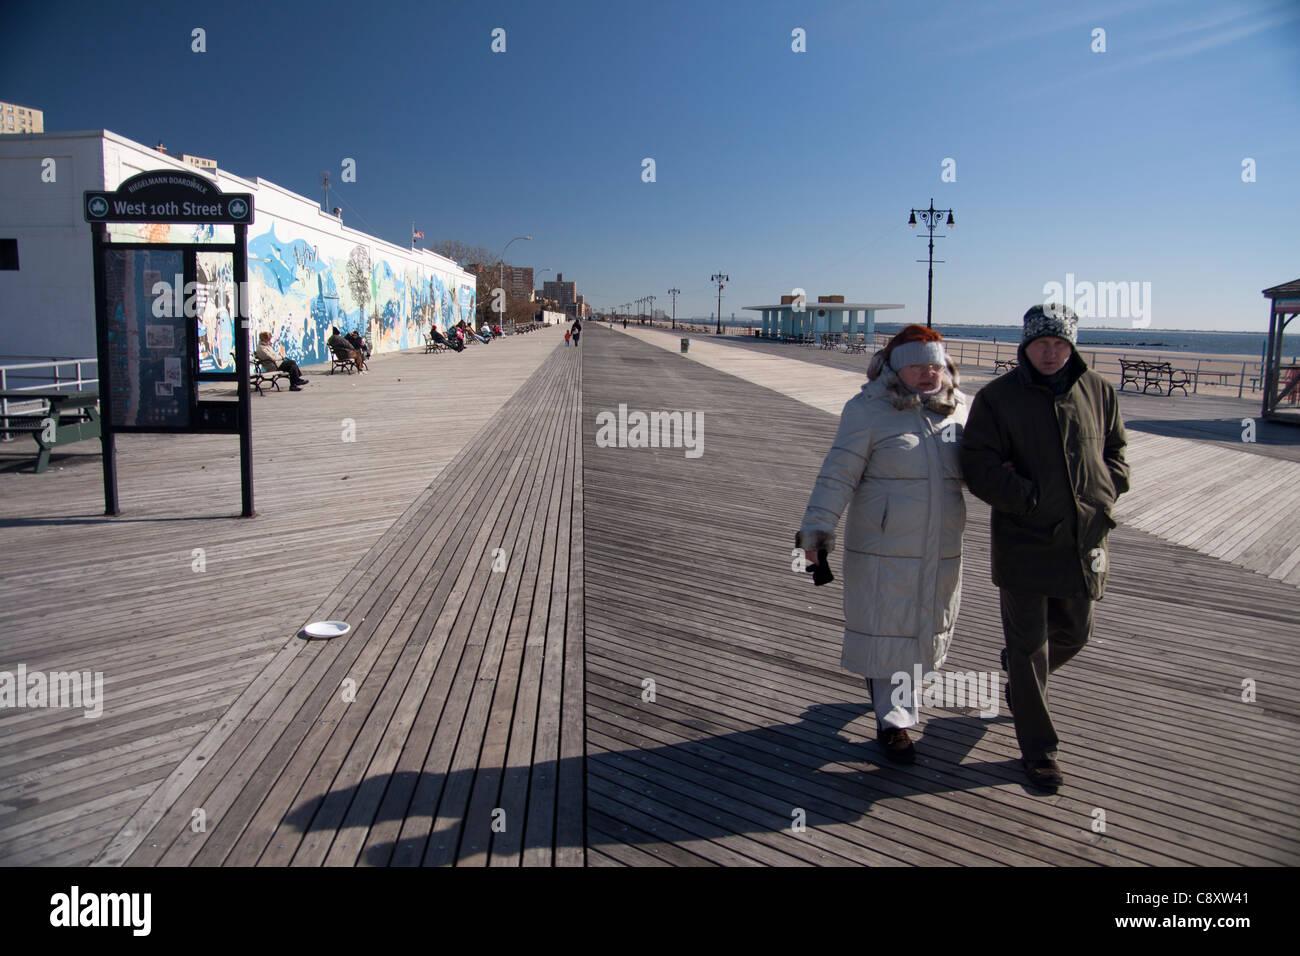 A couple walk along the boardwalk at Coney Island, New York city. - Stock Image